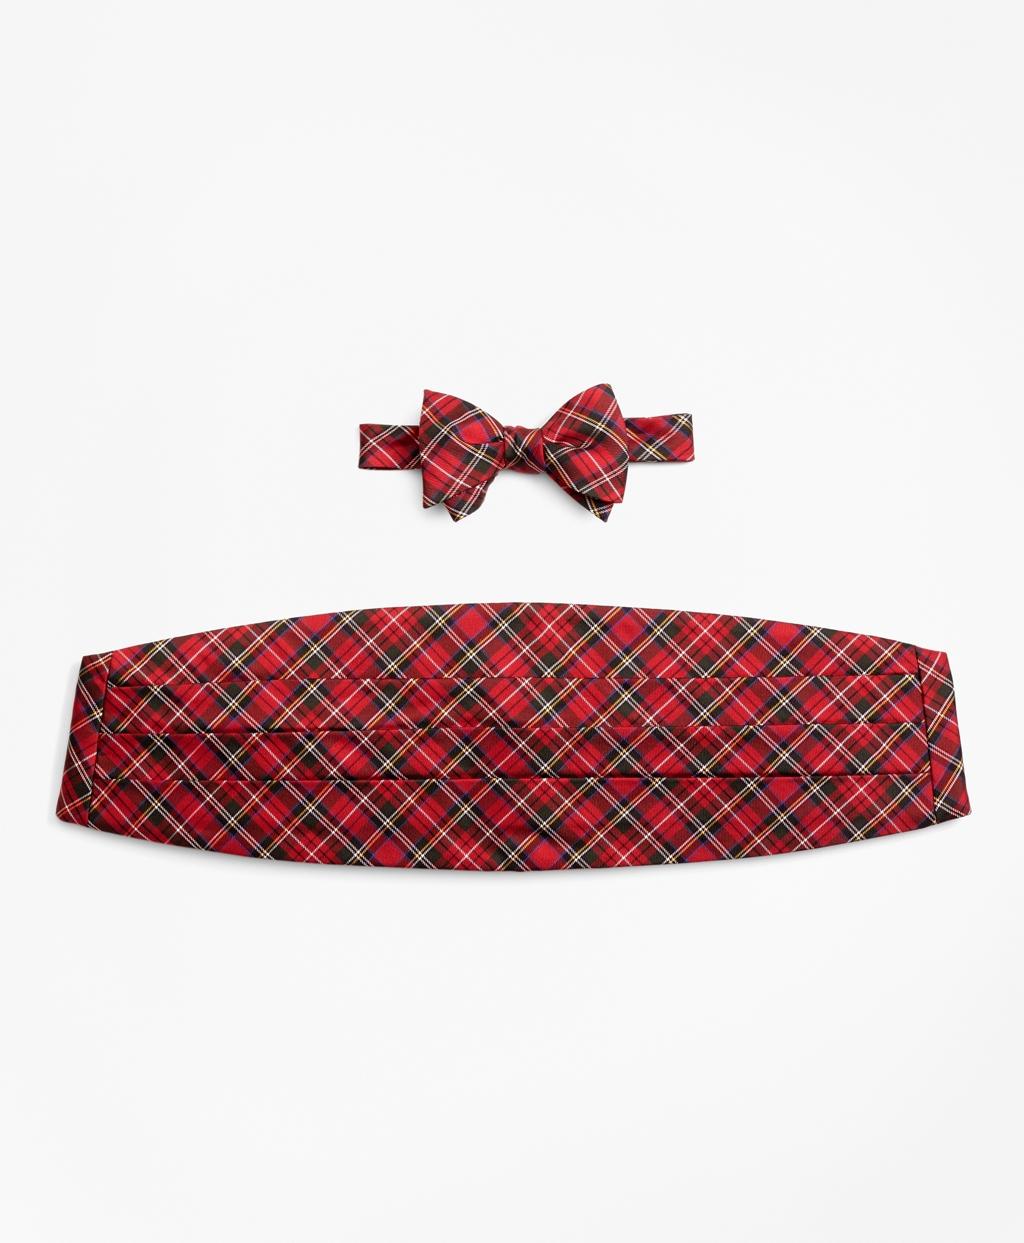 Men's Vintage Style Clothing Brooks Brothers Mens Stewart Tartan Bow Tie And Cummerbund Set $150.00 AT vintagedancer.com